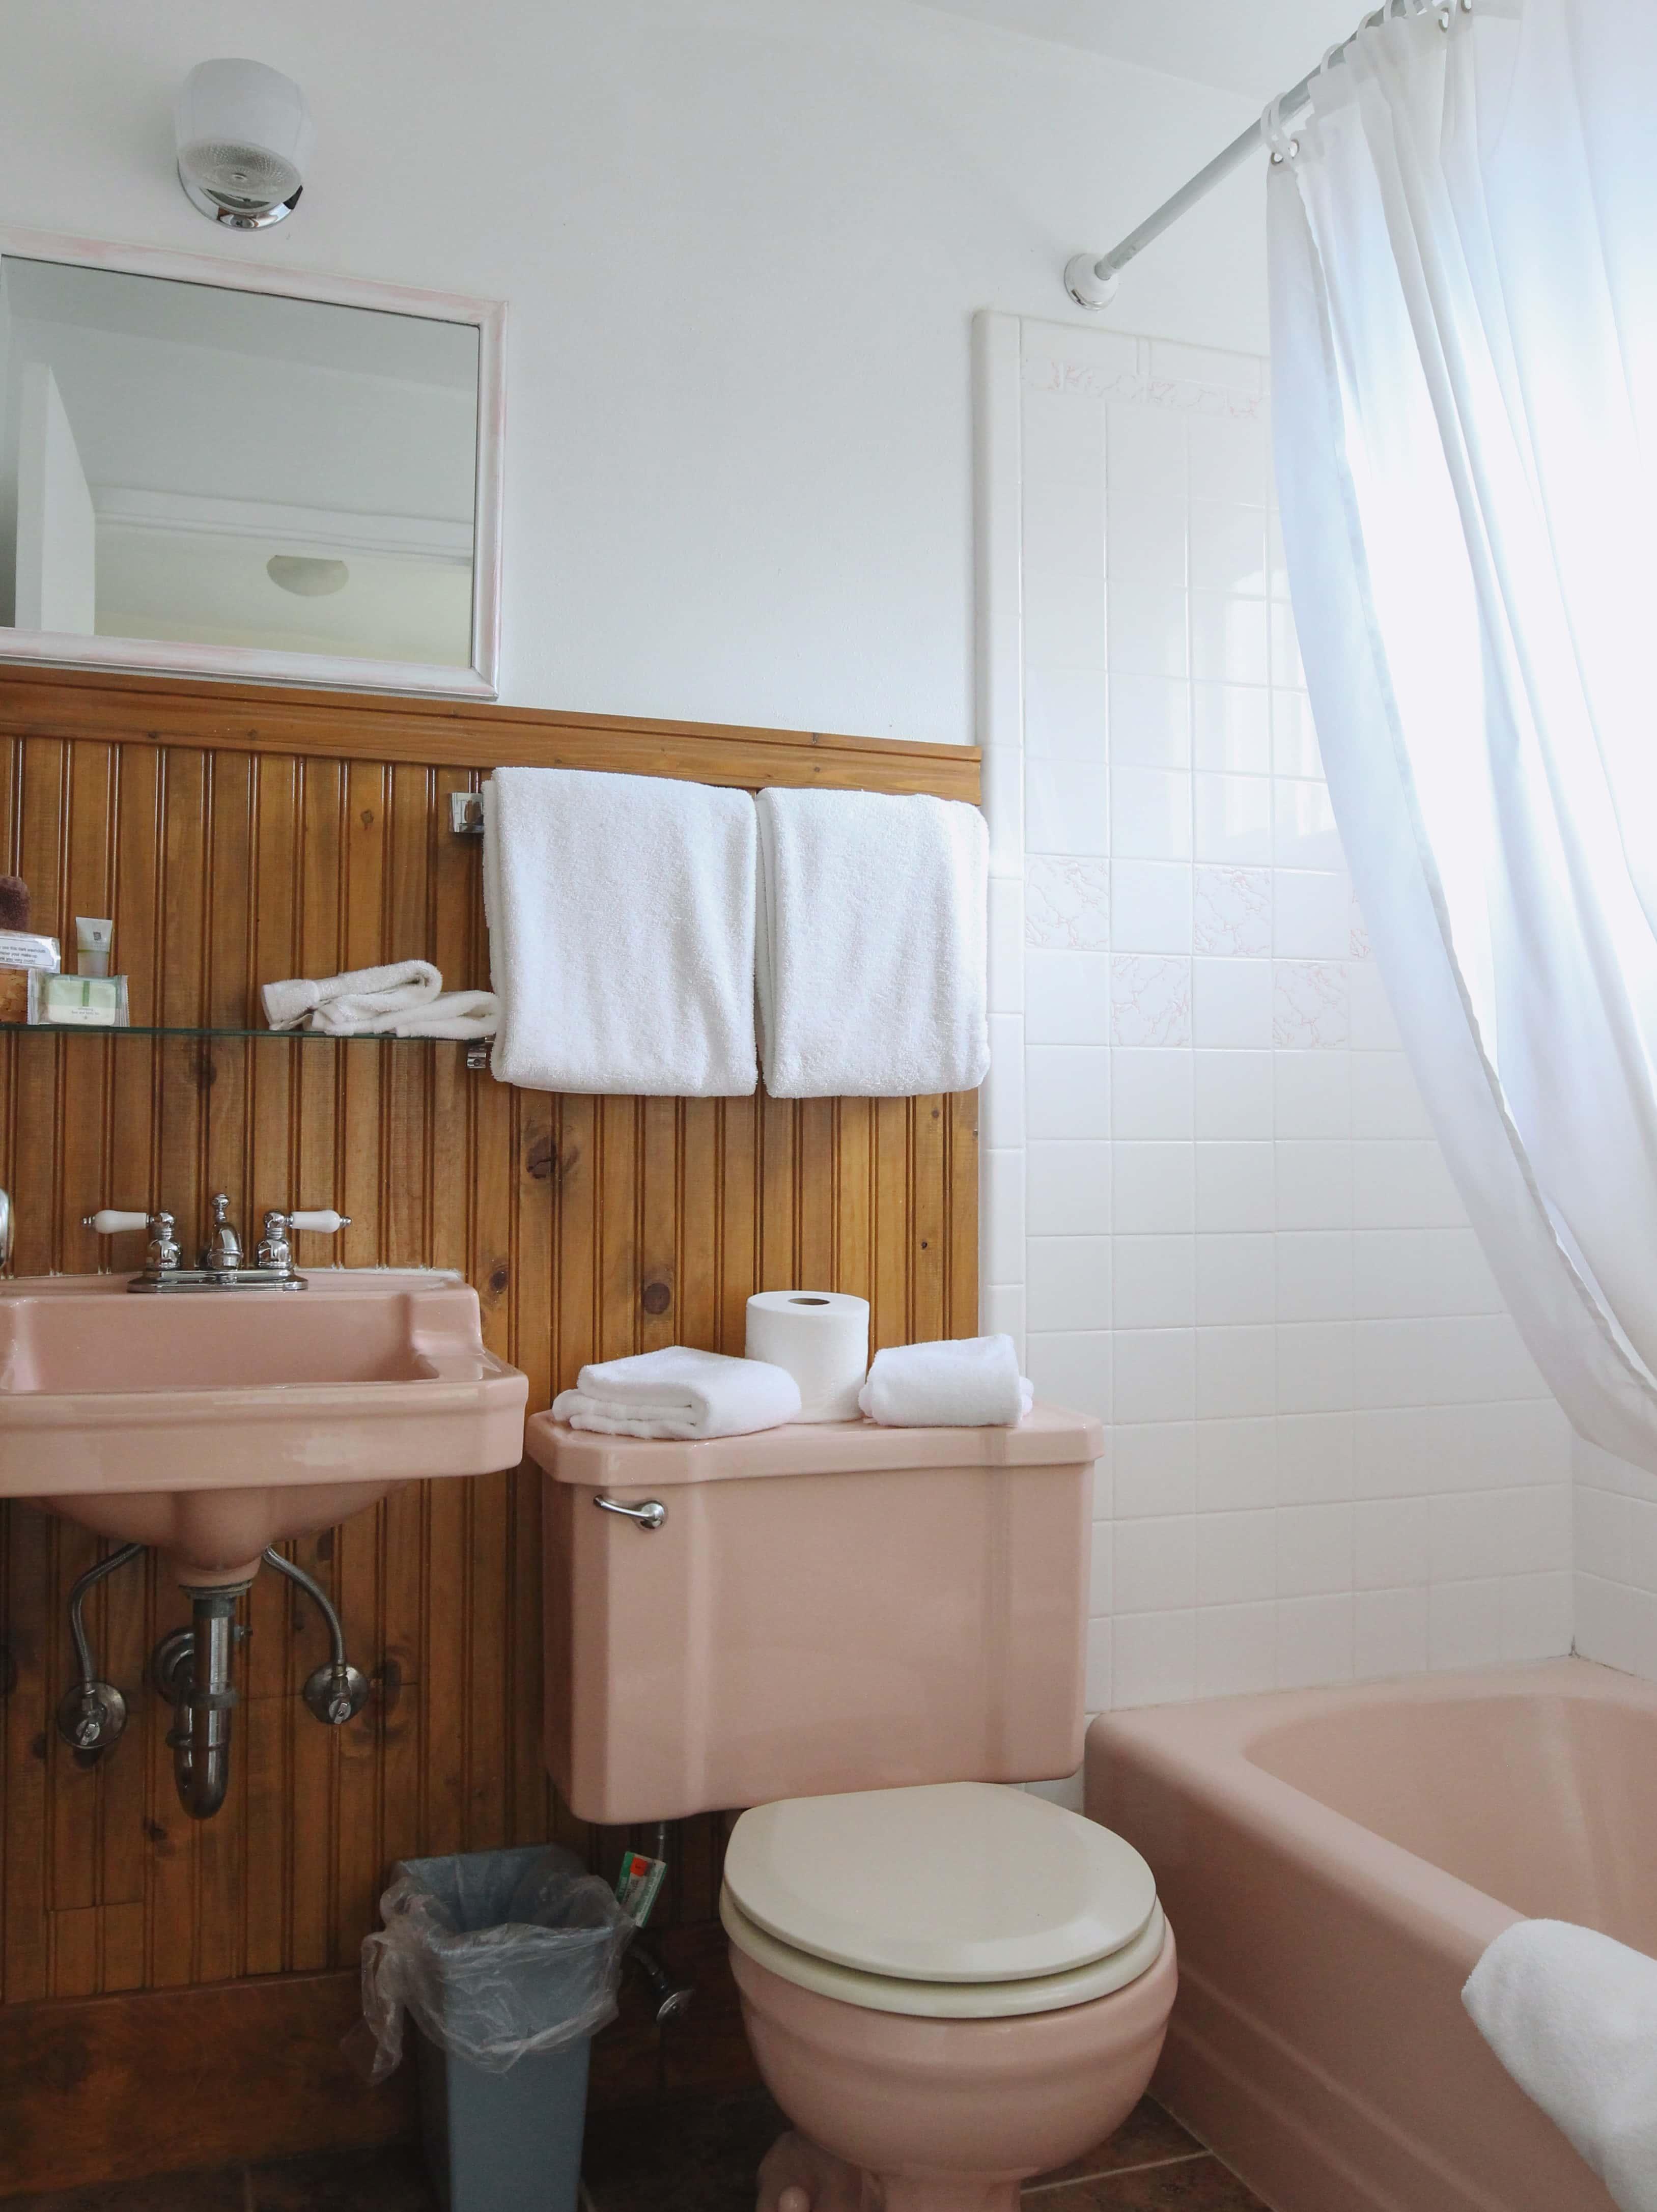 Emerald Valley Inn - Pine Room Bathroom